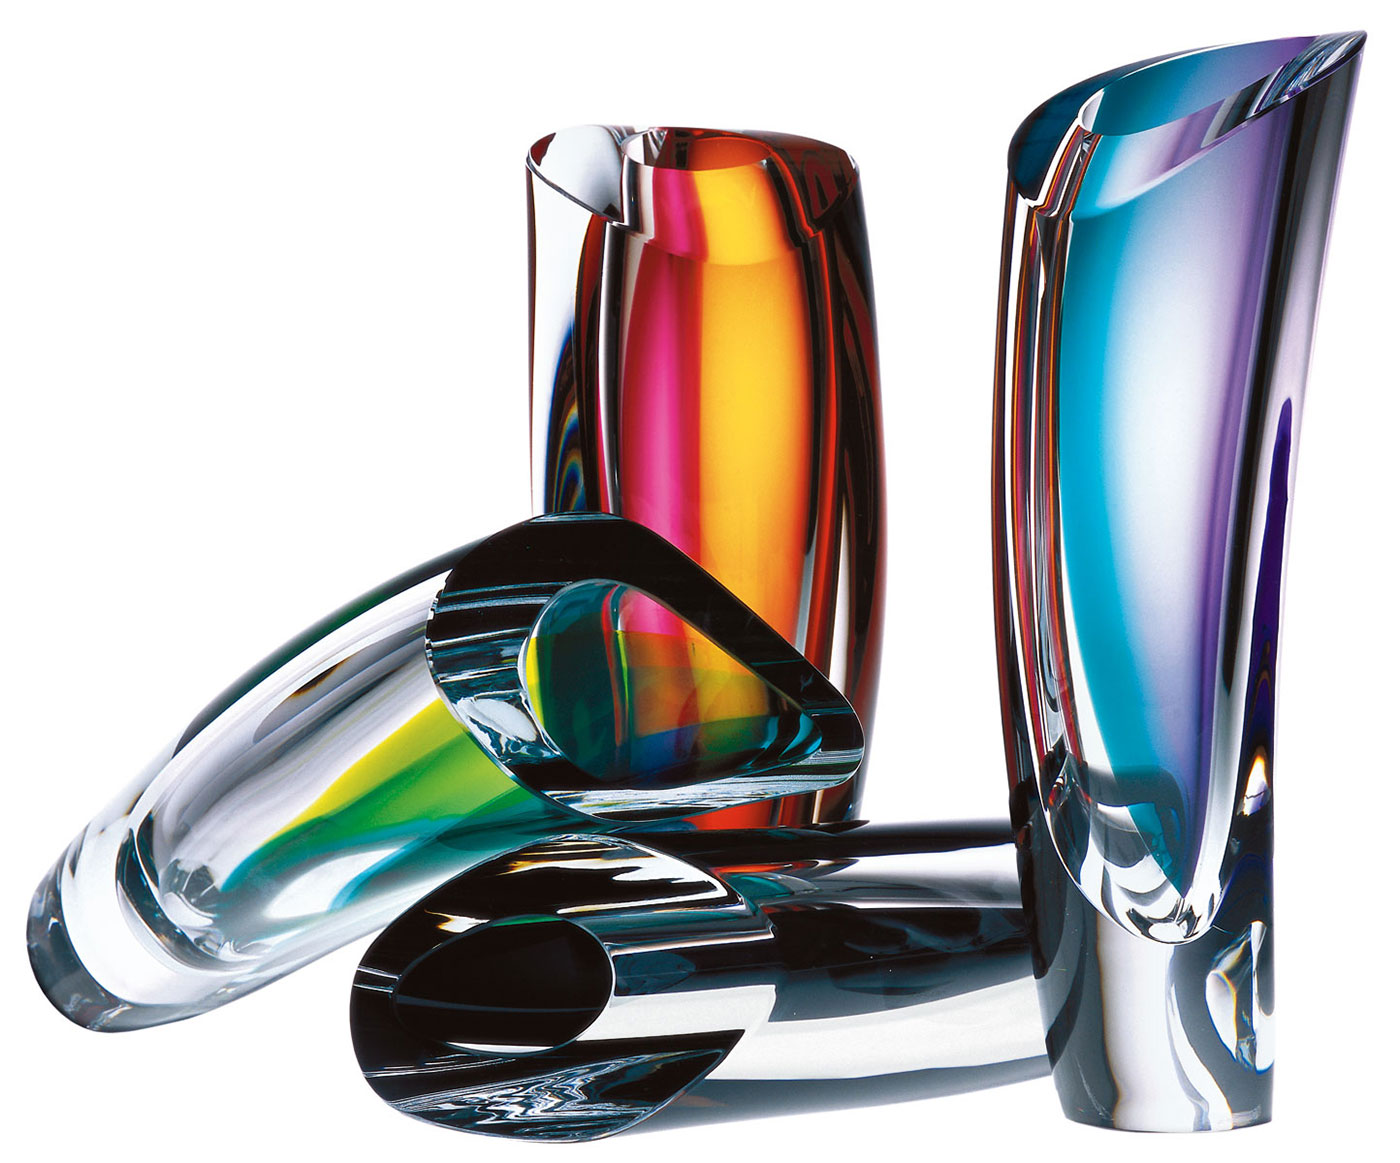 Obegi Home Accessories Kosta Boda Mirage Vase Blue Amber